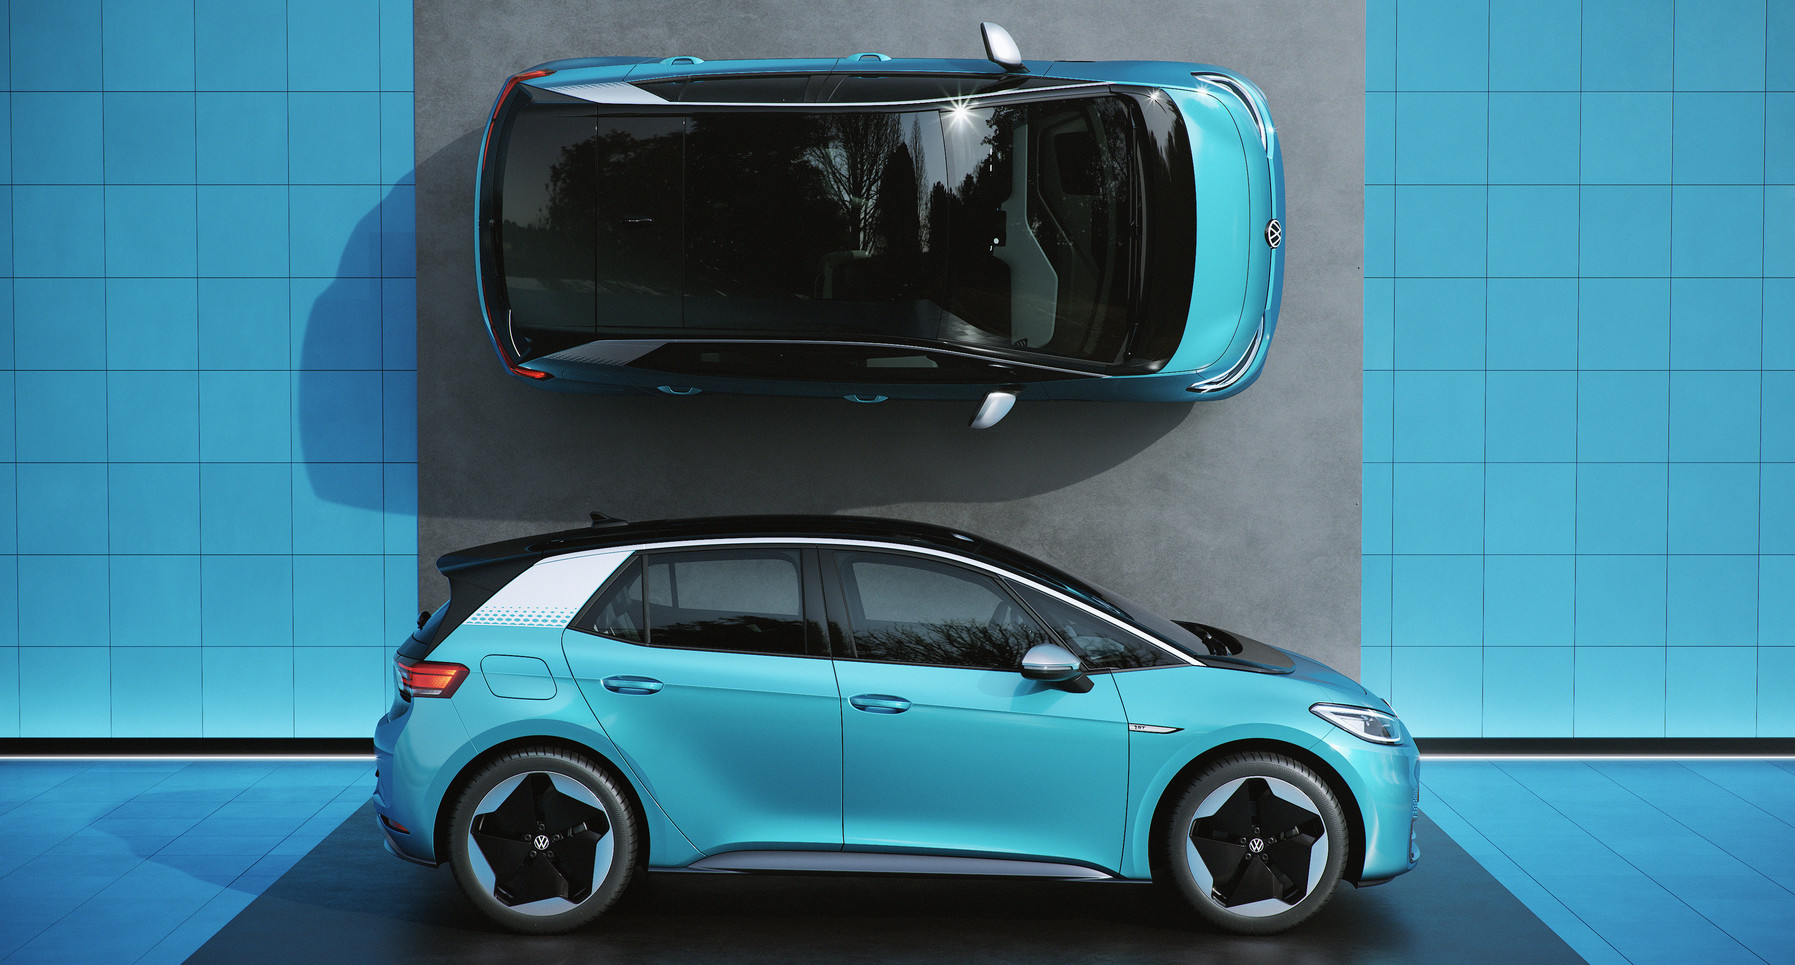 Inicia la venta masiva de Volkswagen ID.3 en Europa